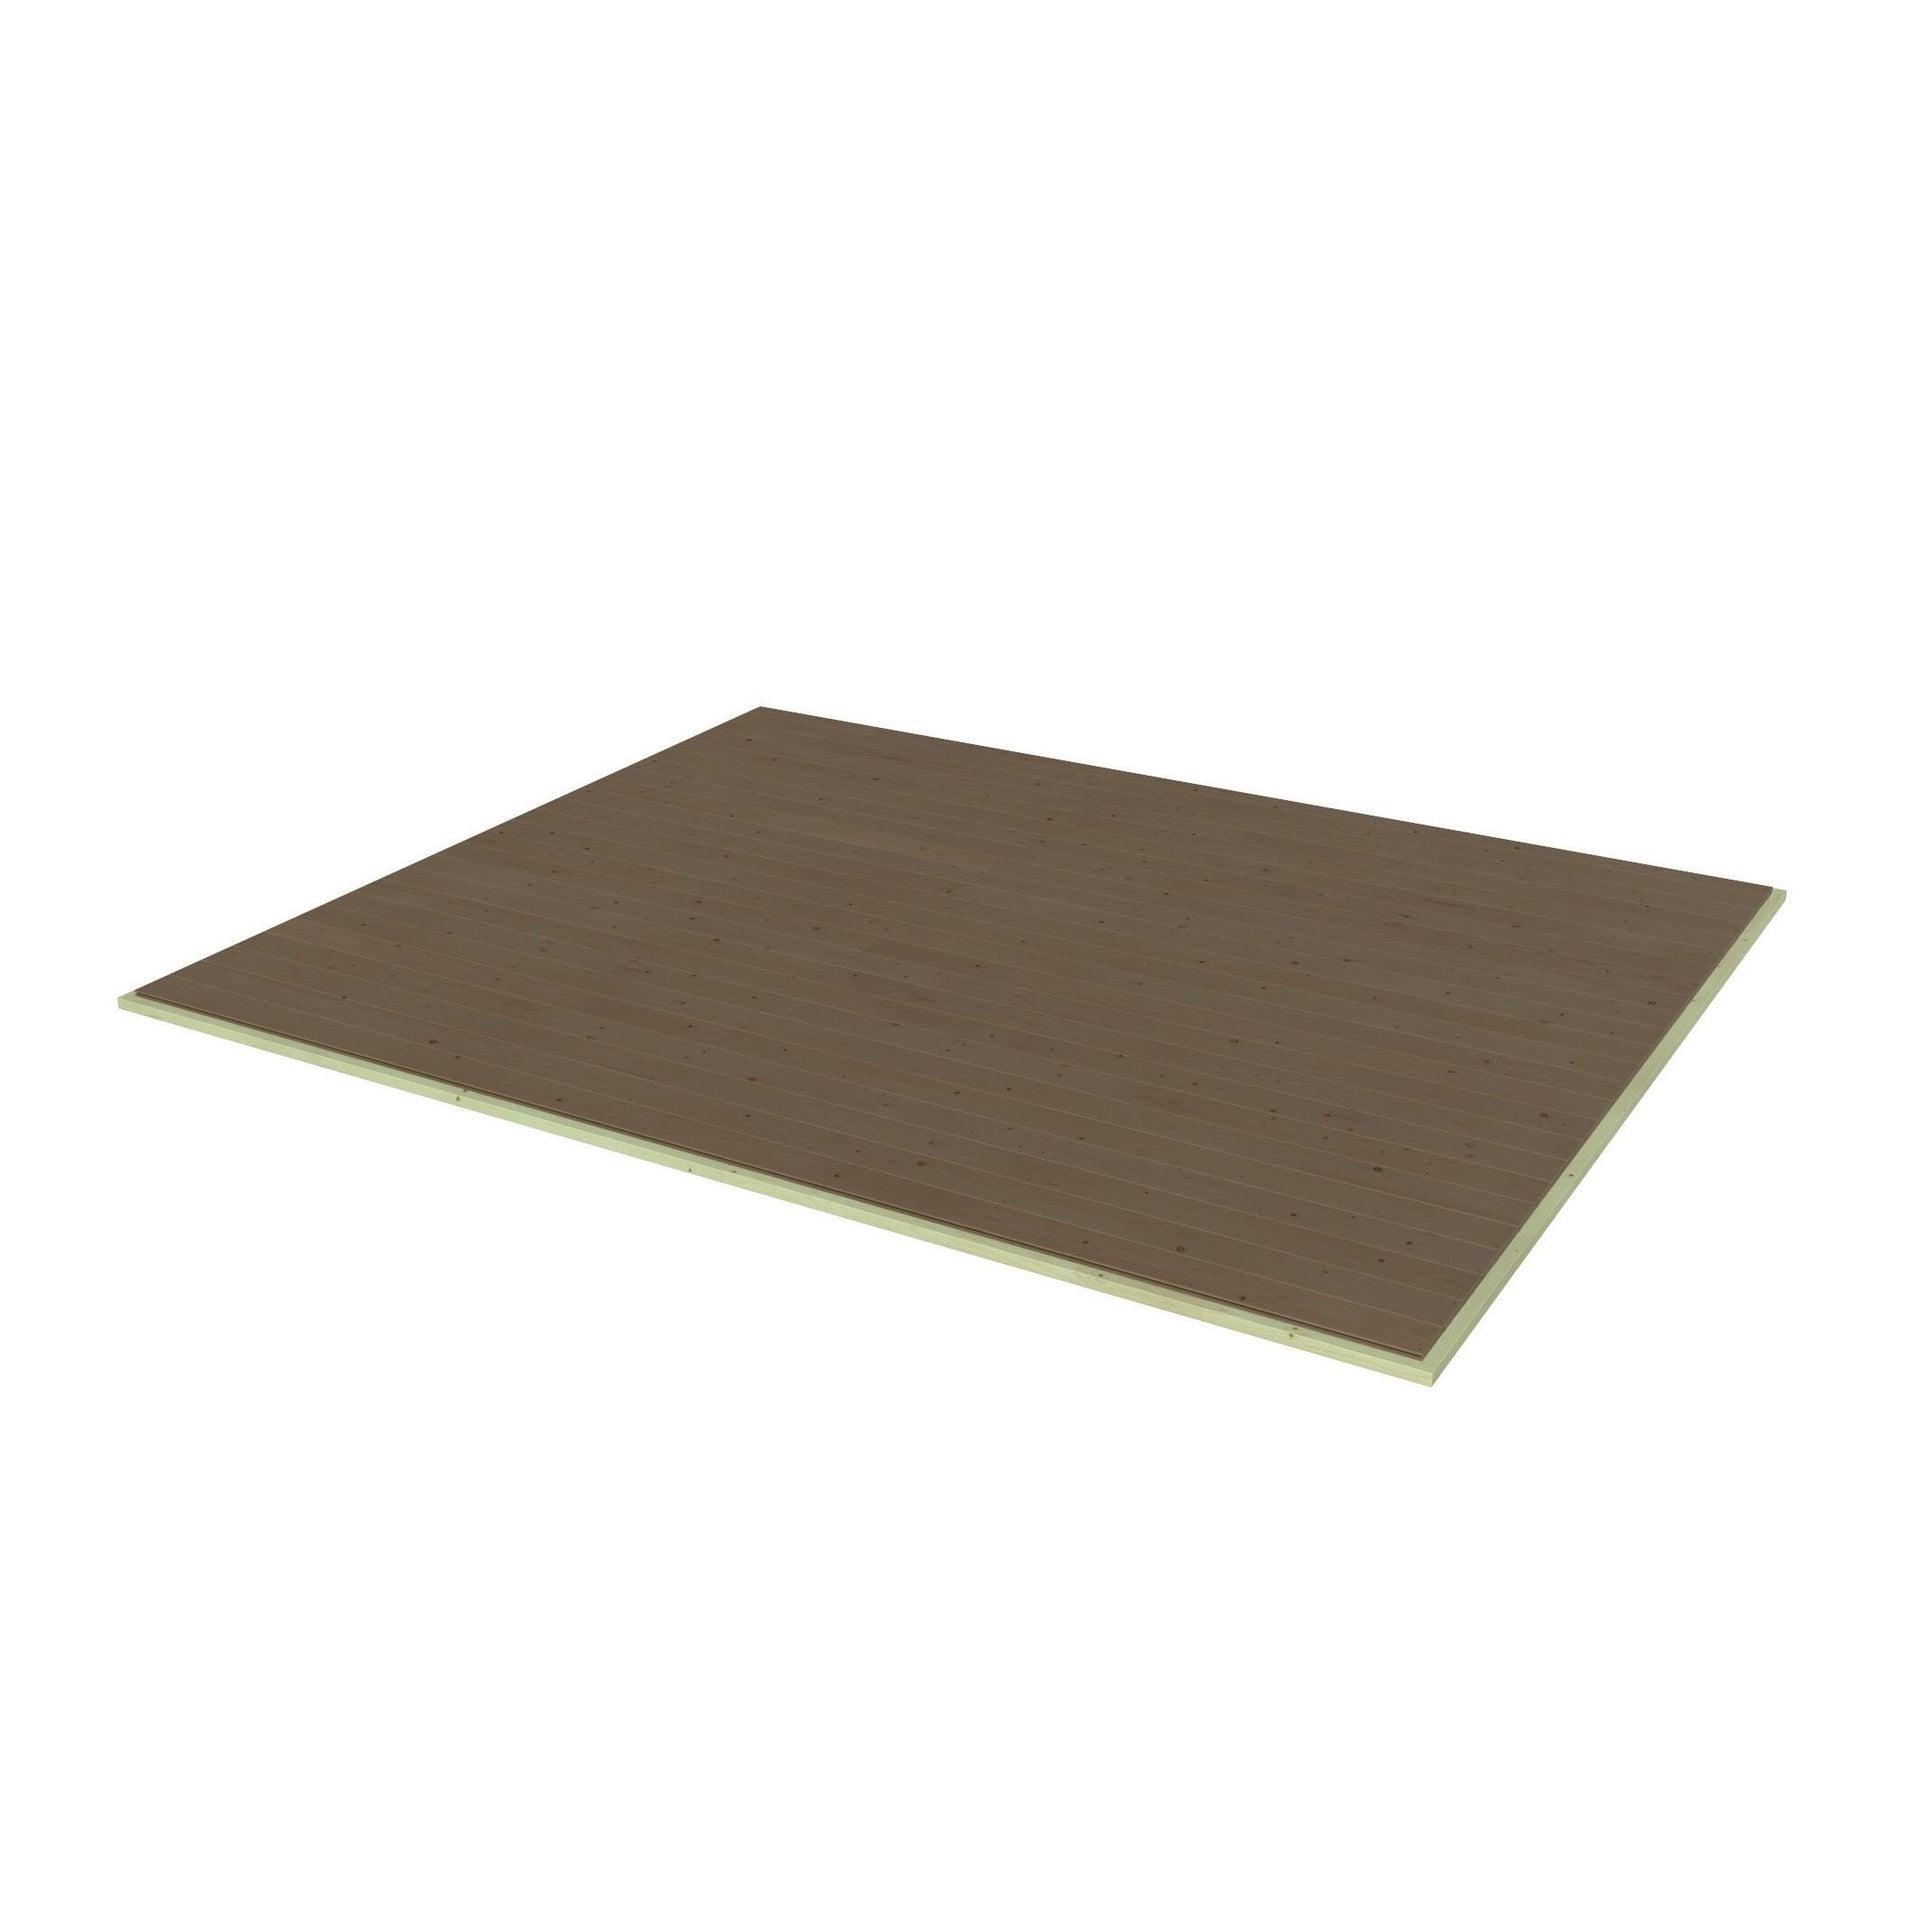 Pavimento per casetta da giardino Azalea DECOR ET JARDIN 332.4 x 300 x 45 cm - 1